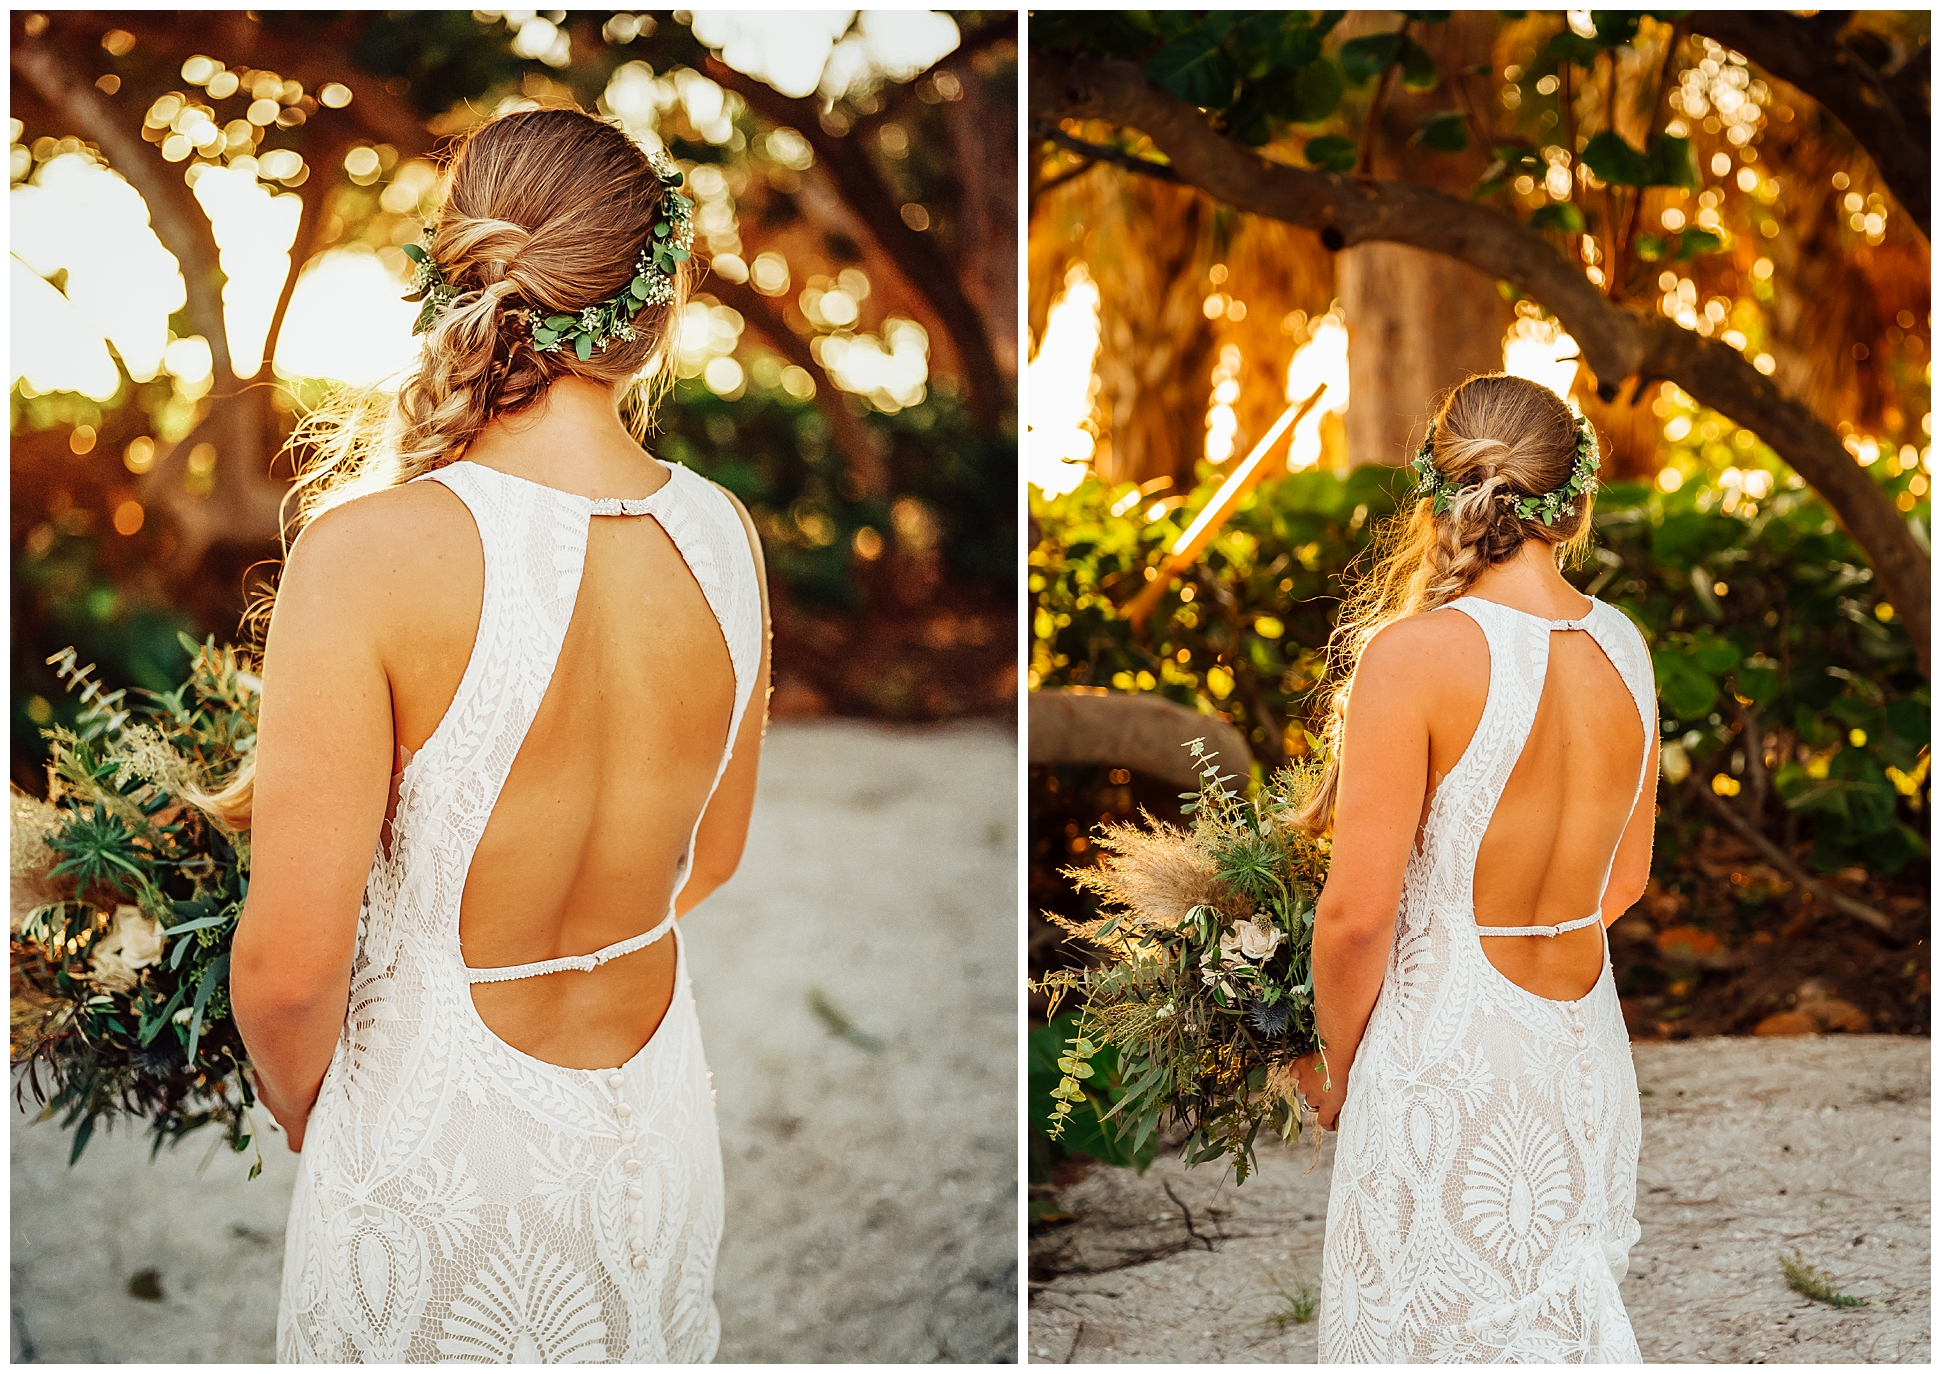 medium-format-film-vs-digital-wedding-photography-florida-beach_0021.jpg